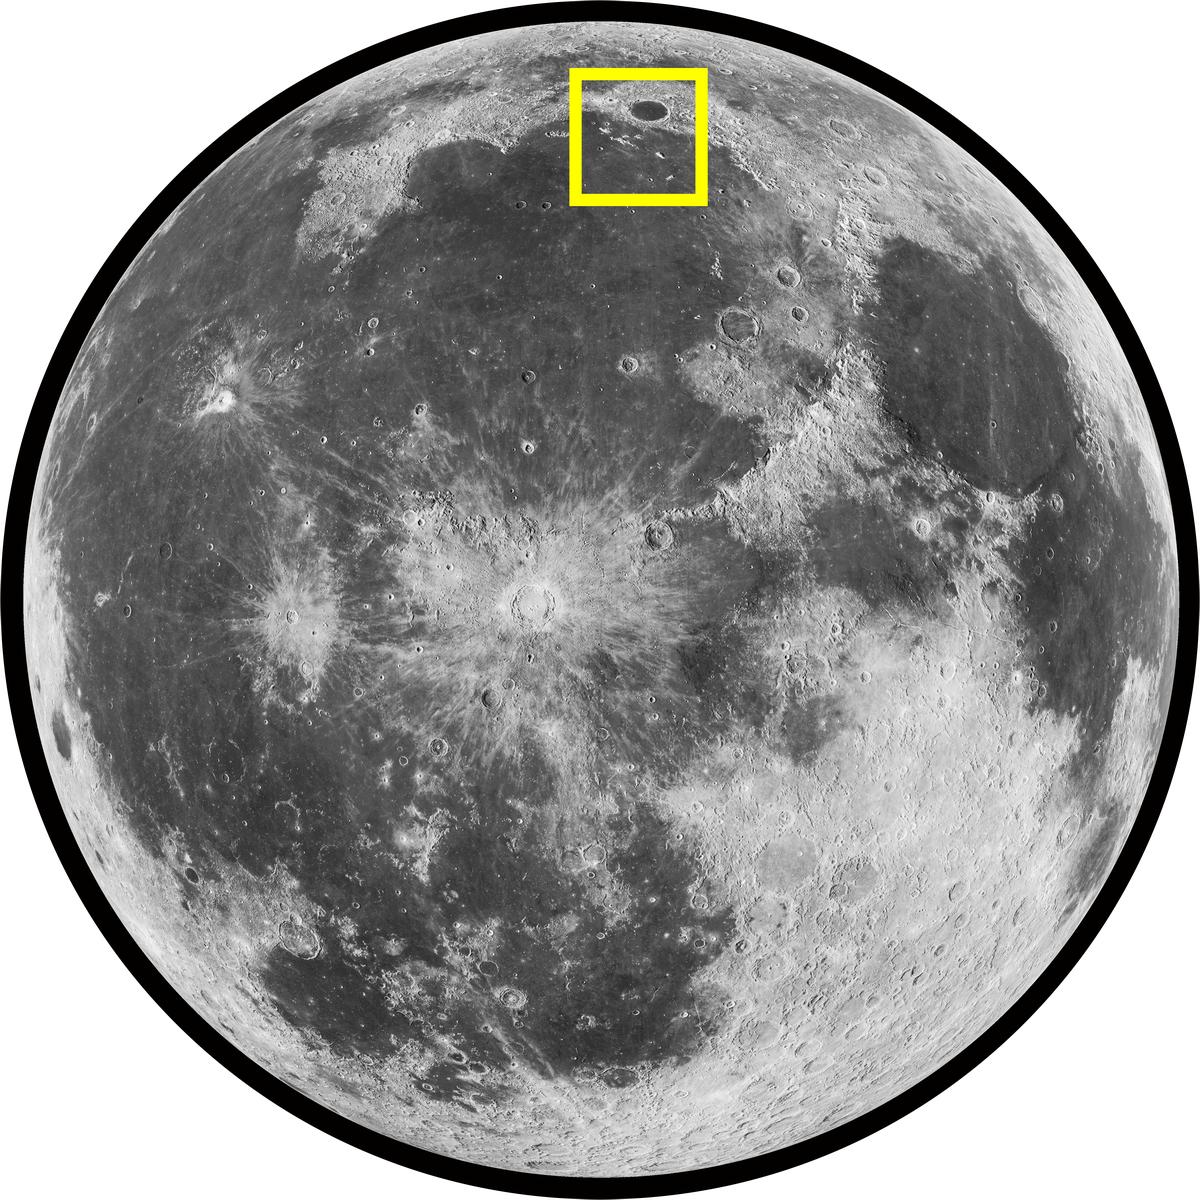 Mare Imbrium (Sea of Rains) on the Moon